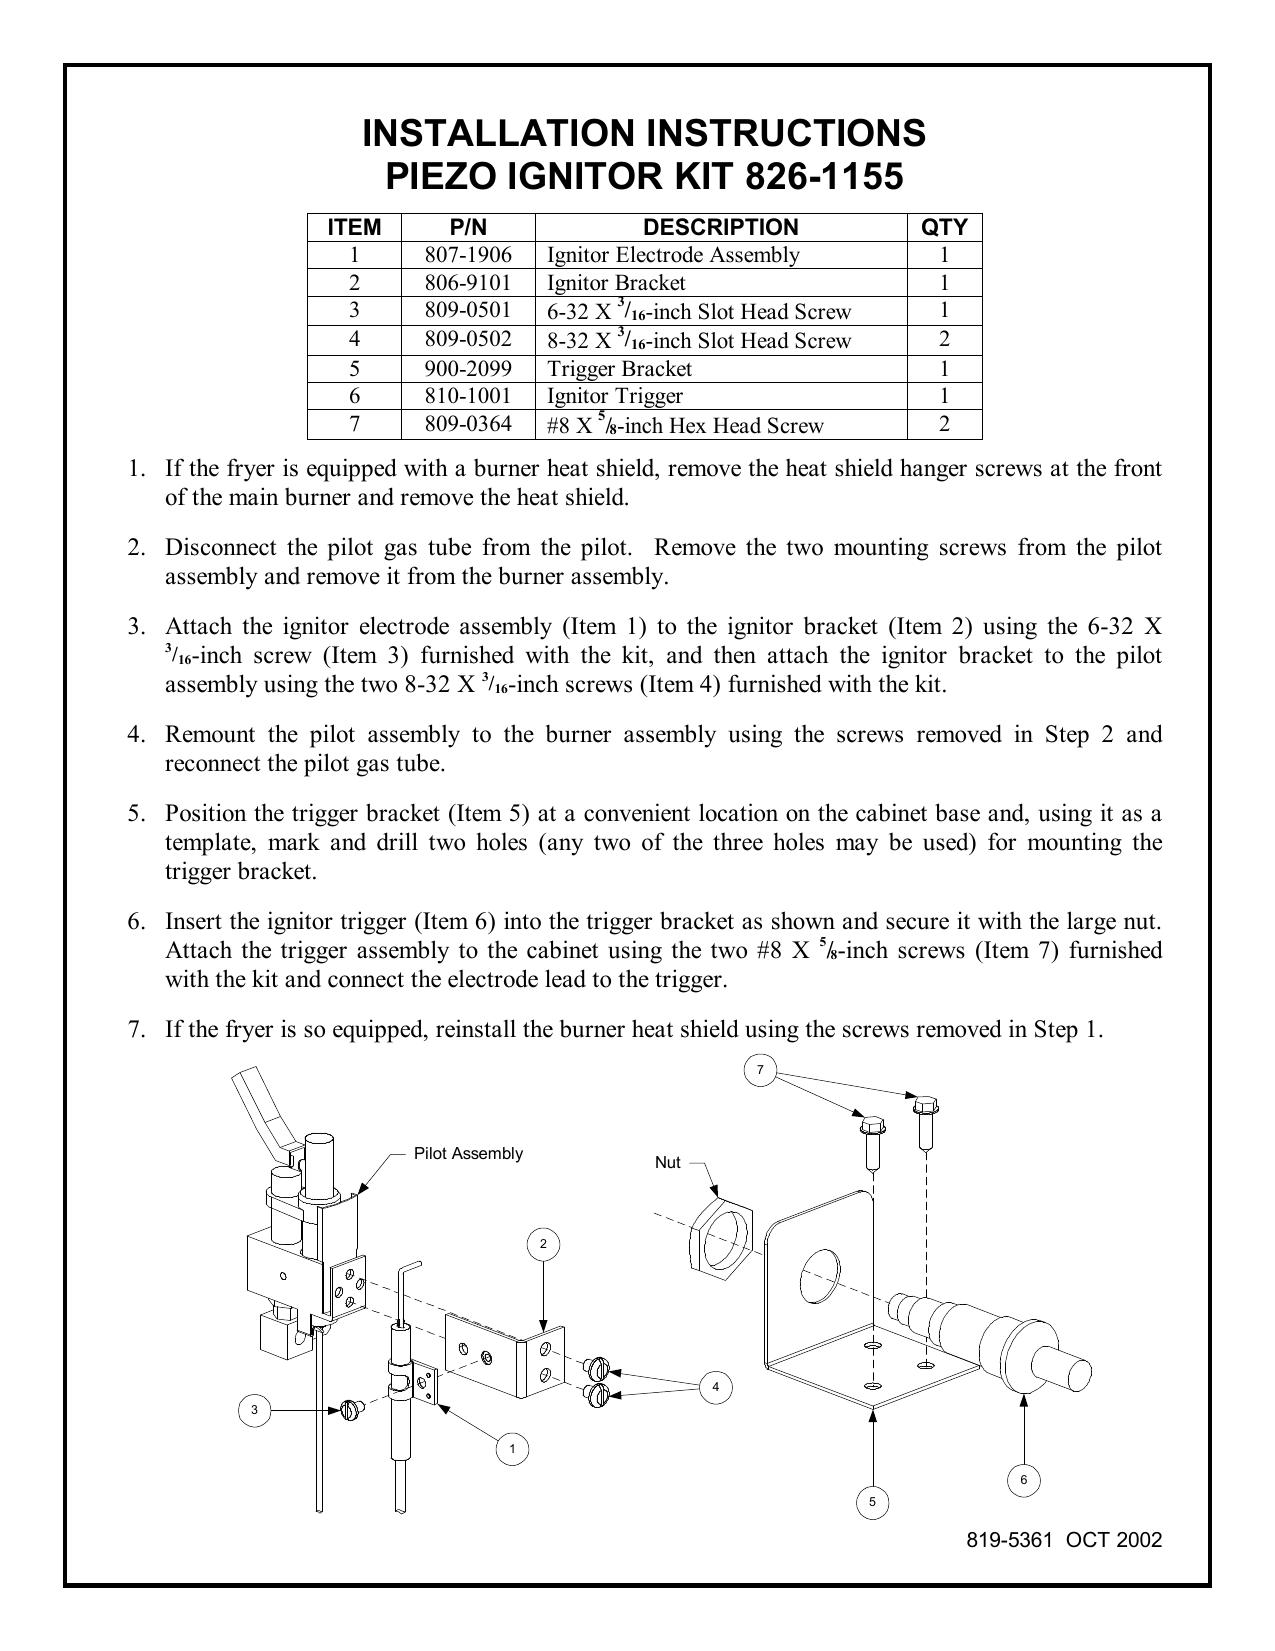 installation instructions piezo ignitor kit 826-1155